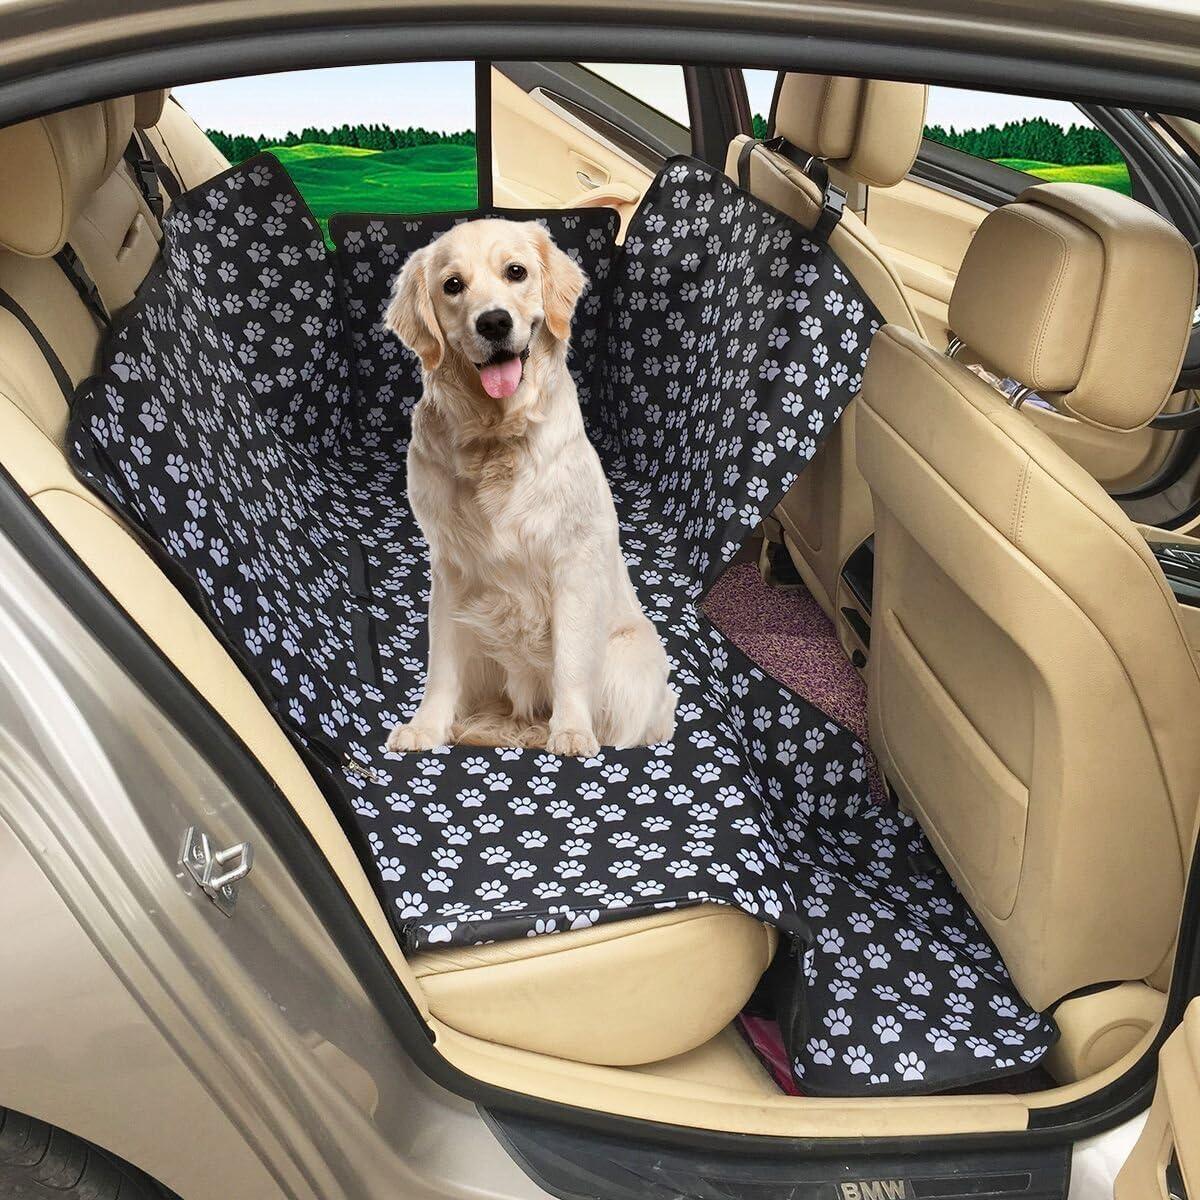 Petcute Hundedecke Auto Rickbank Hundematte Auto Hundedecke Rücksitz Hundeschondecke Fürs Auto Haustier